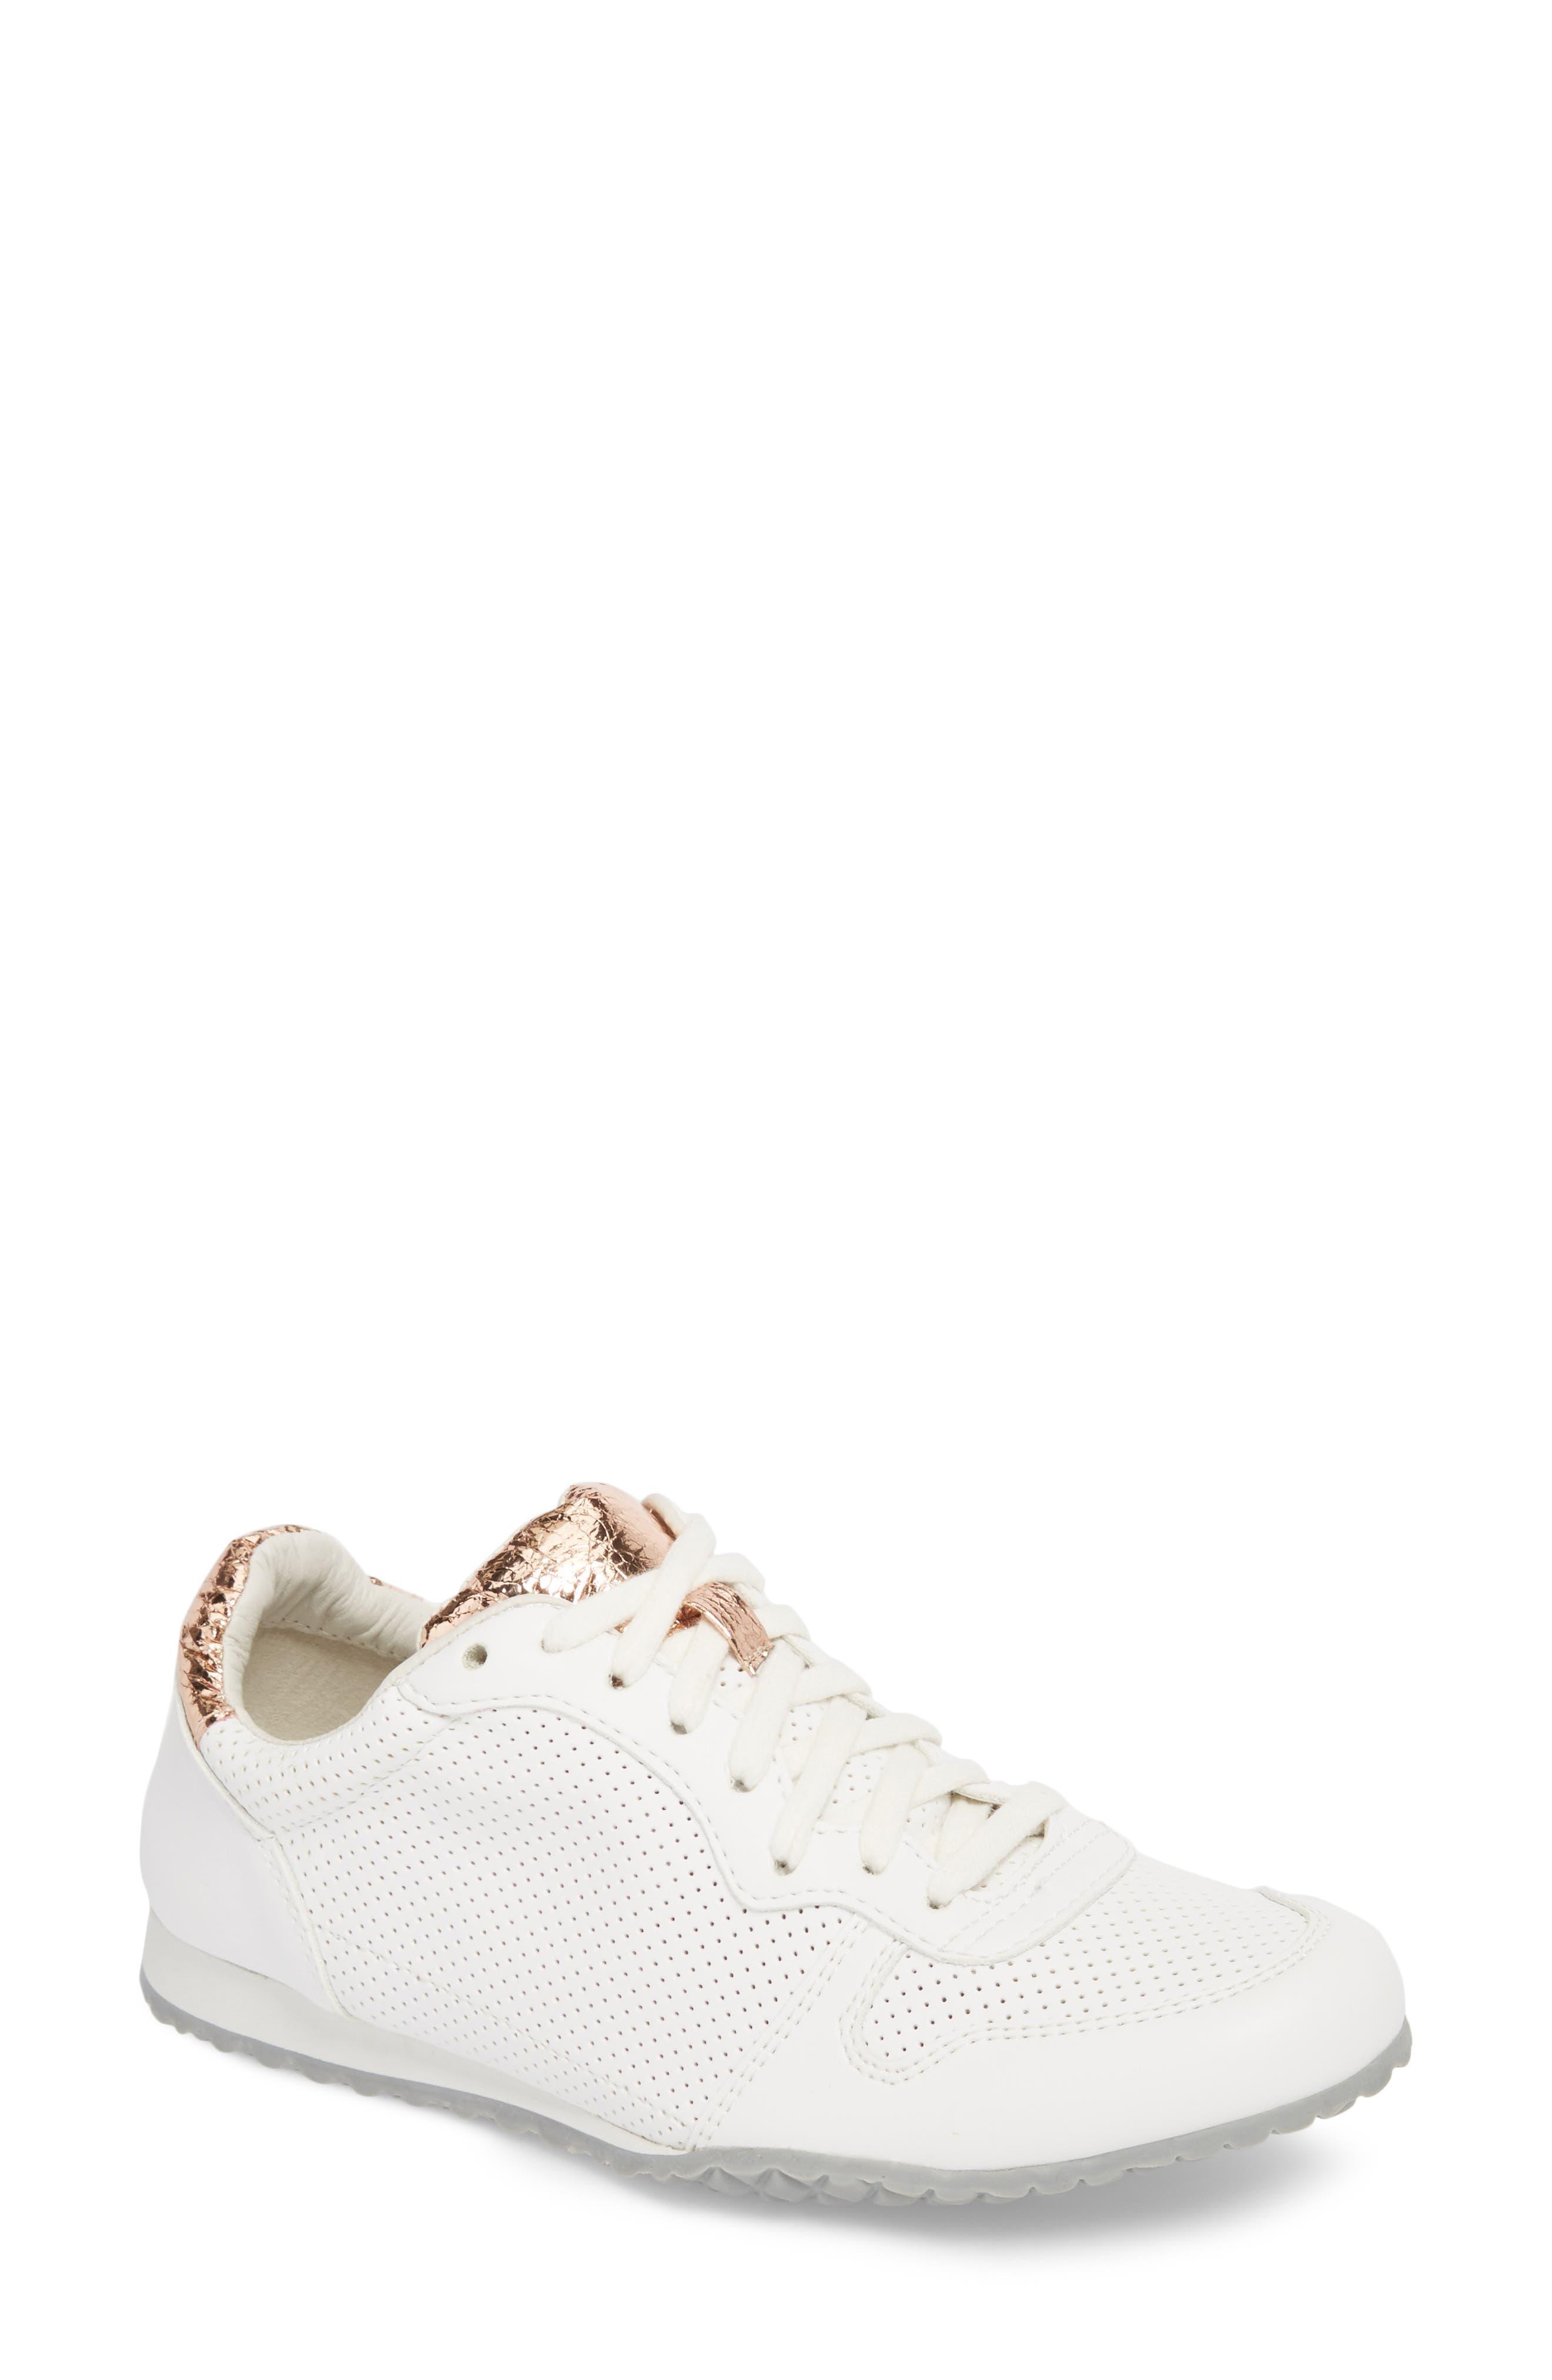 Joanna Perforated Sneaker,                         Main,                         color, 124